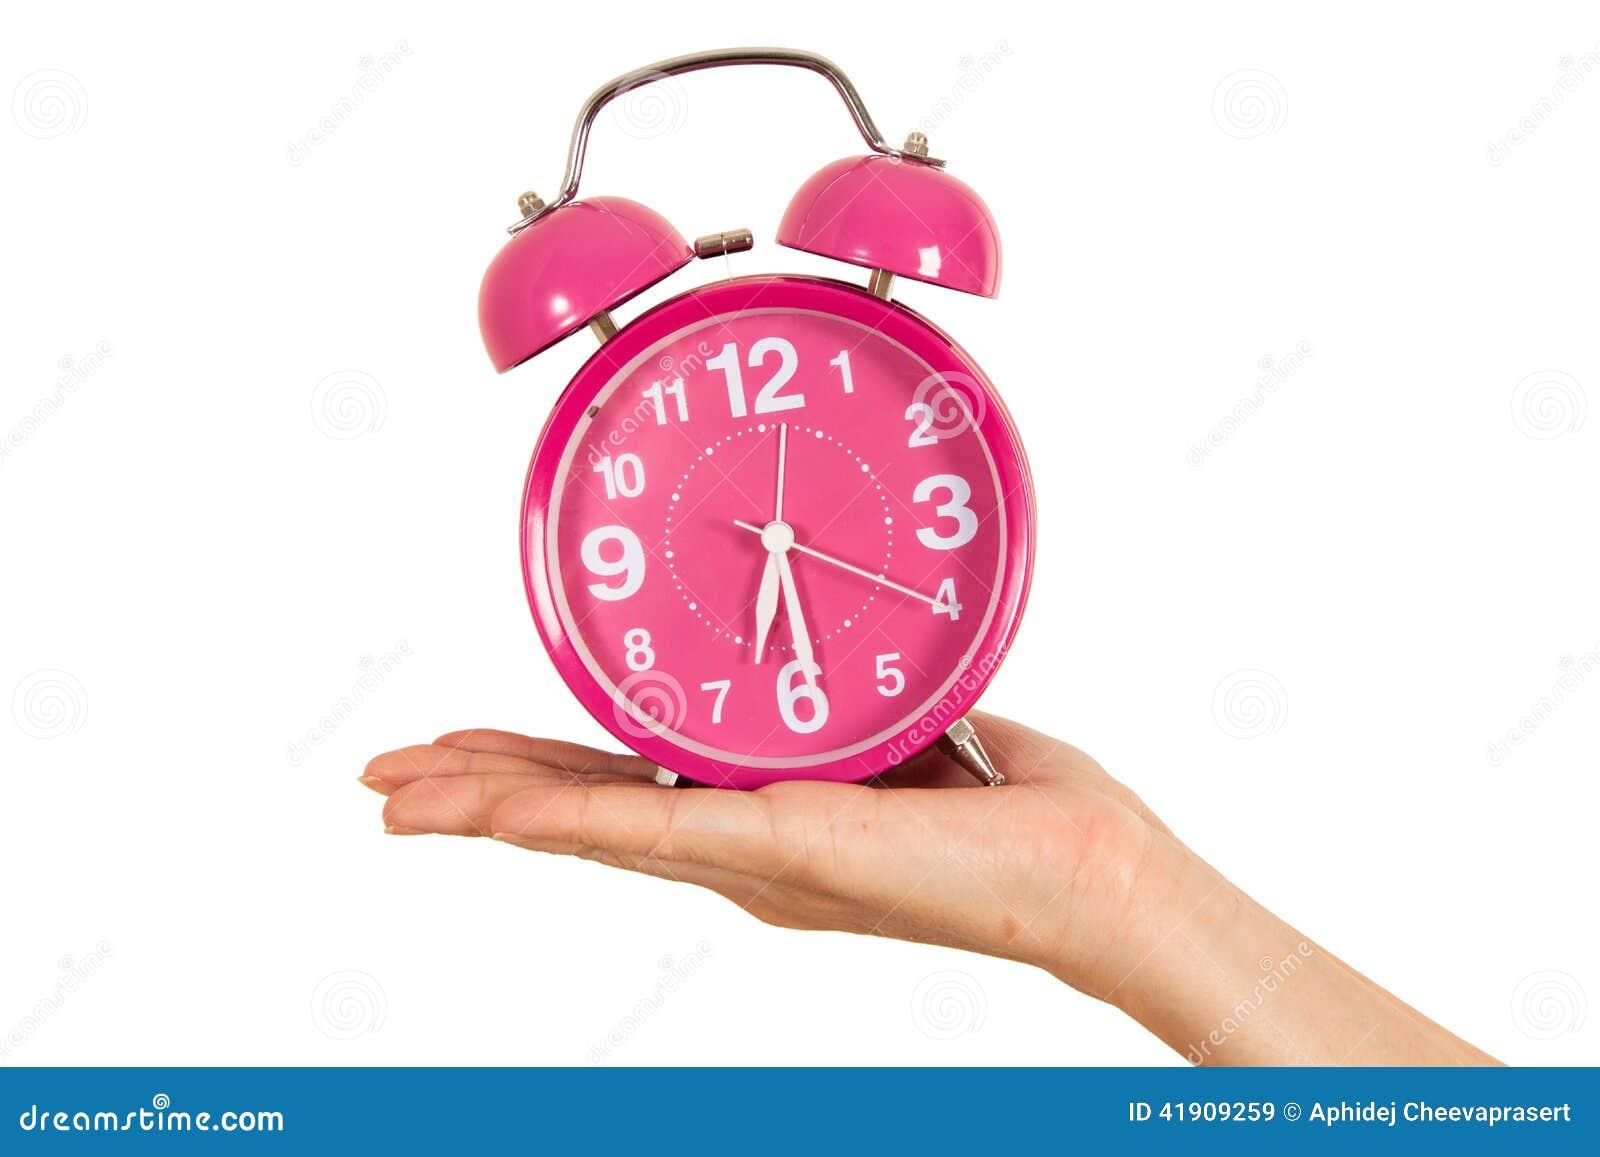 Mostrar el reloj